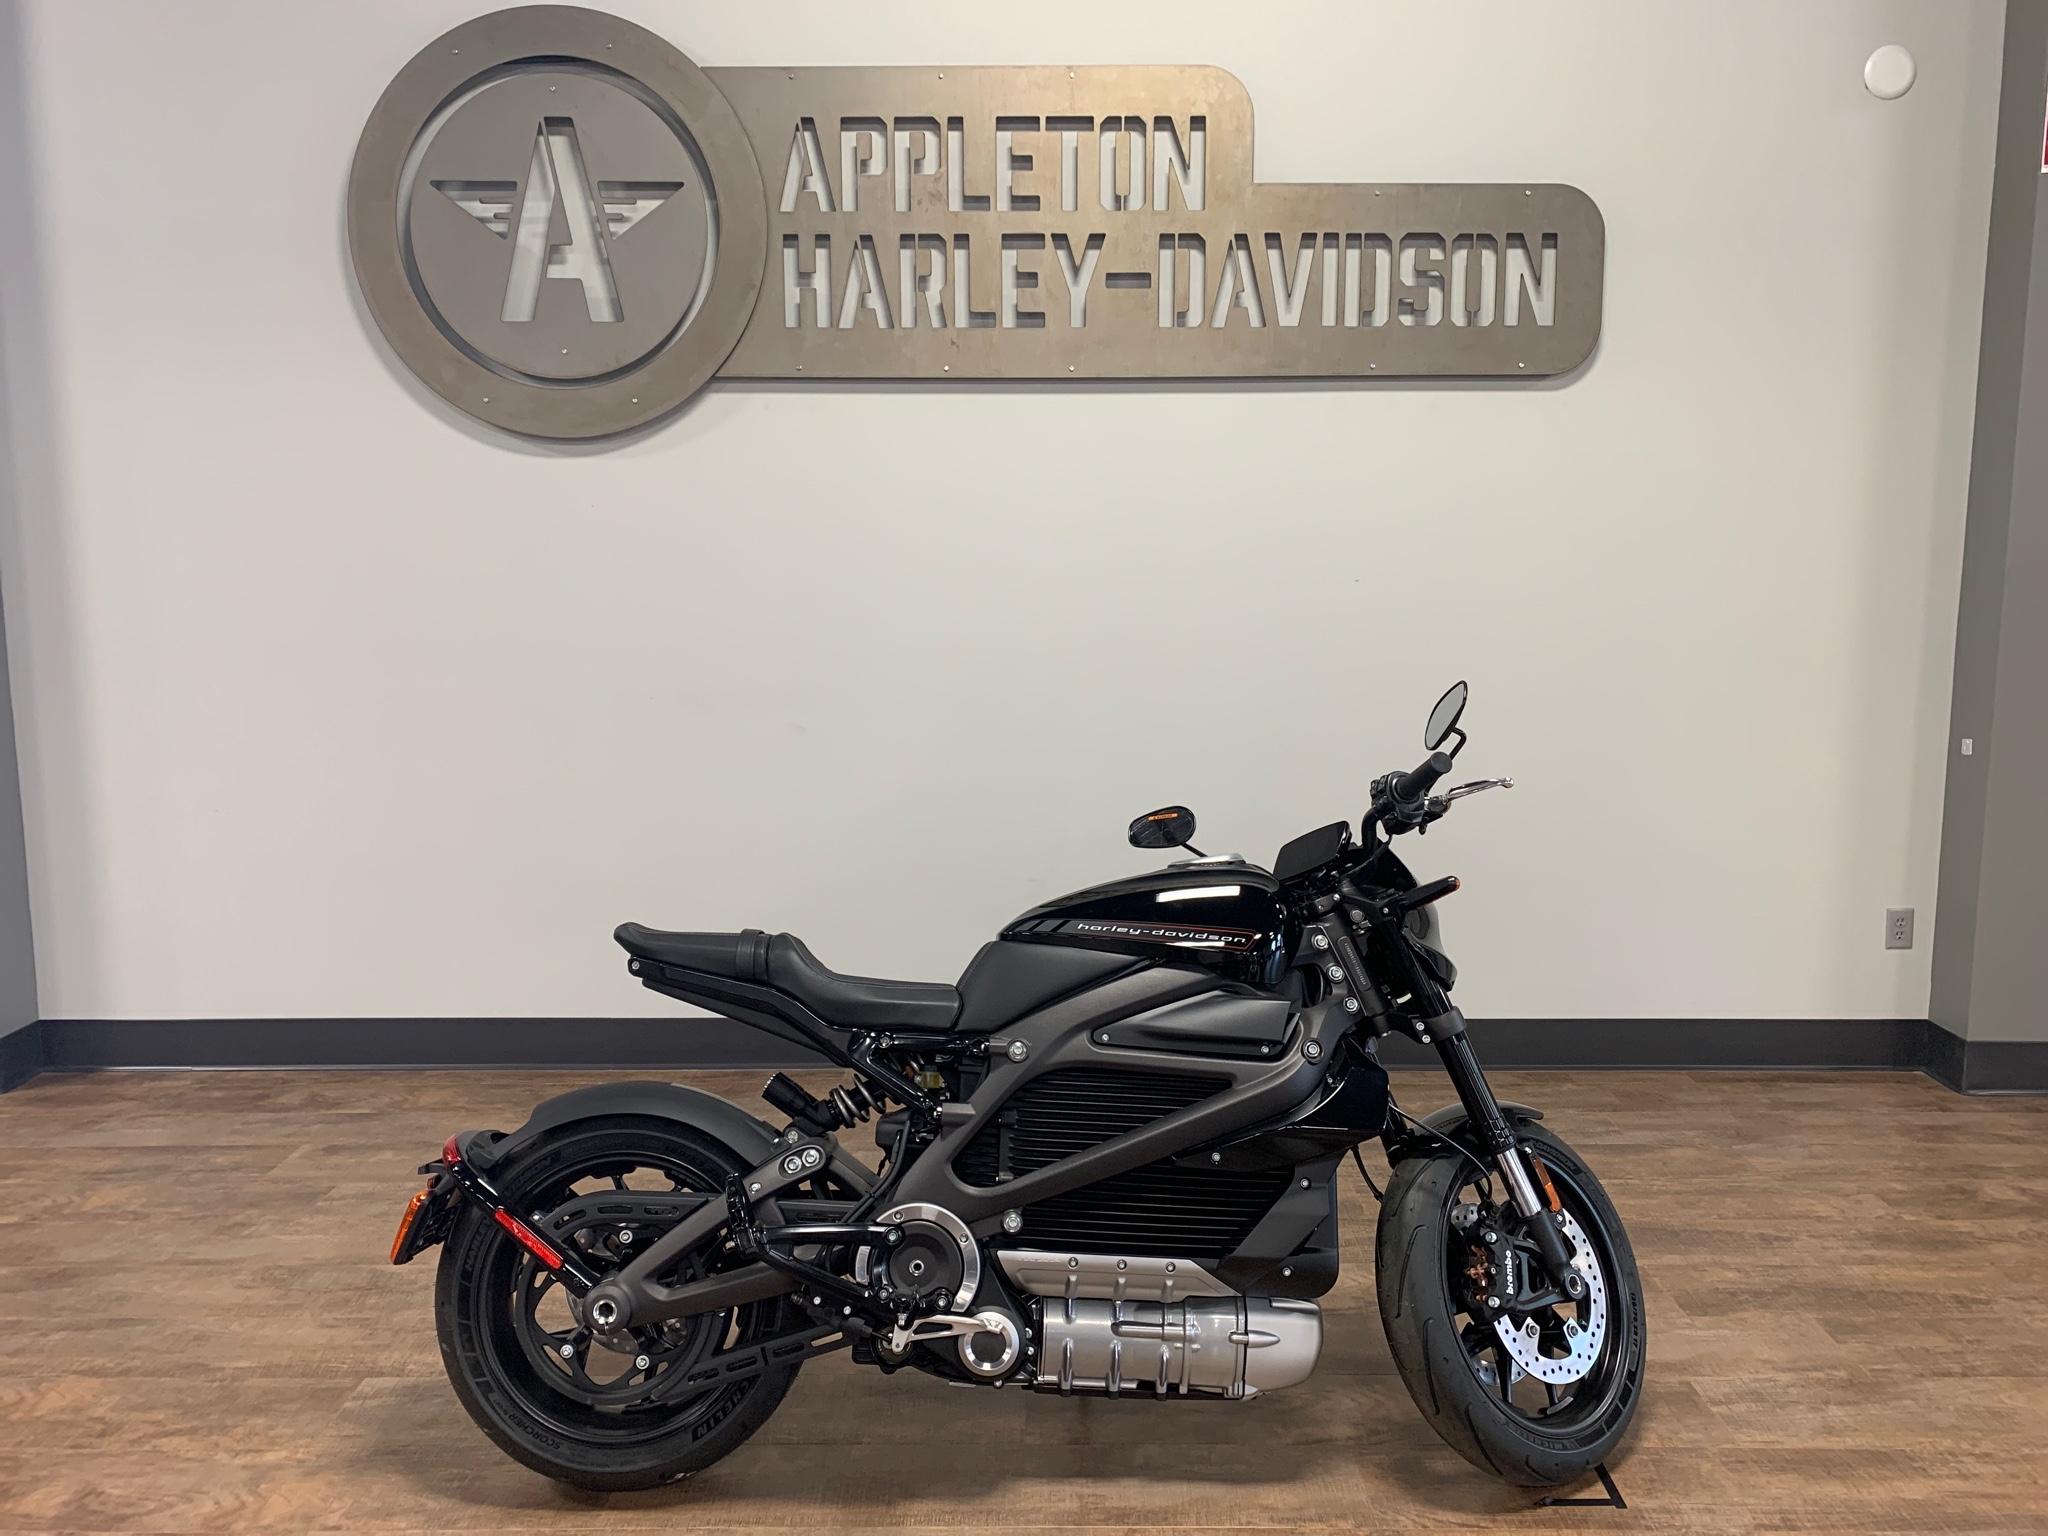 2020 Harley-Davidson Livewire [0]